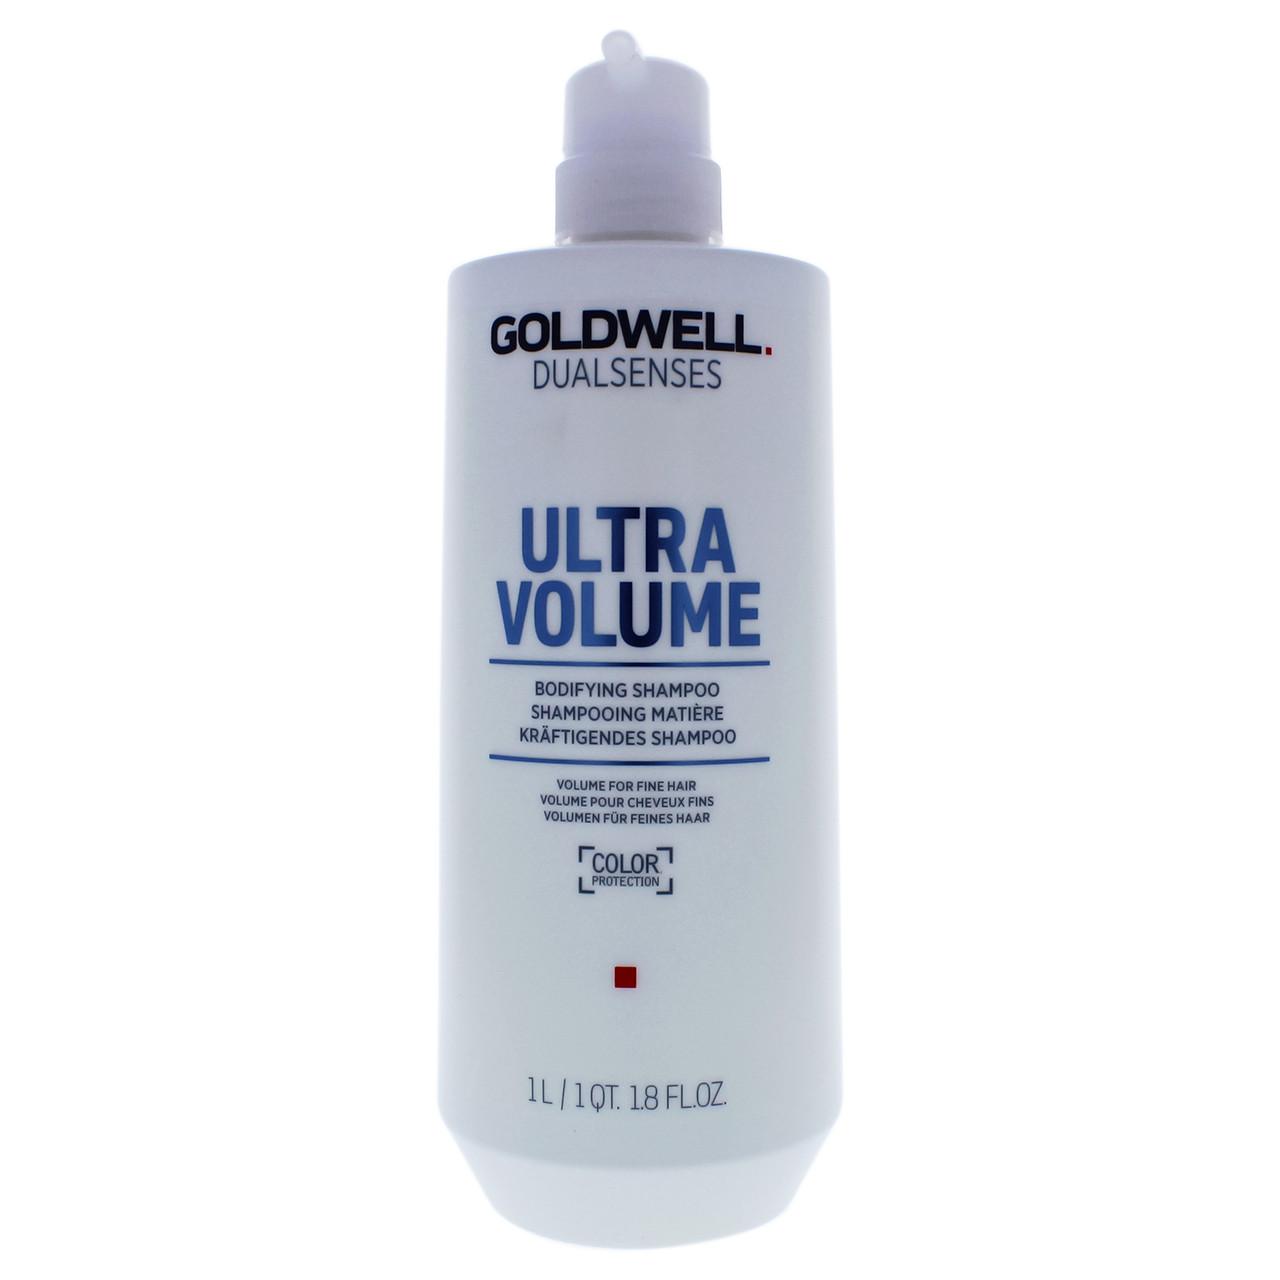 Goldwell DualSenses Ultra Volume Bodifying Shampoo 1 Liter